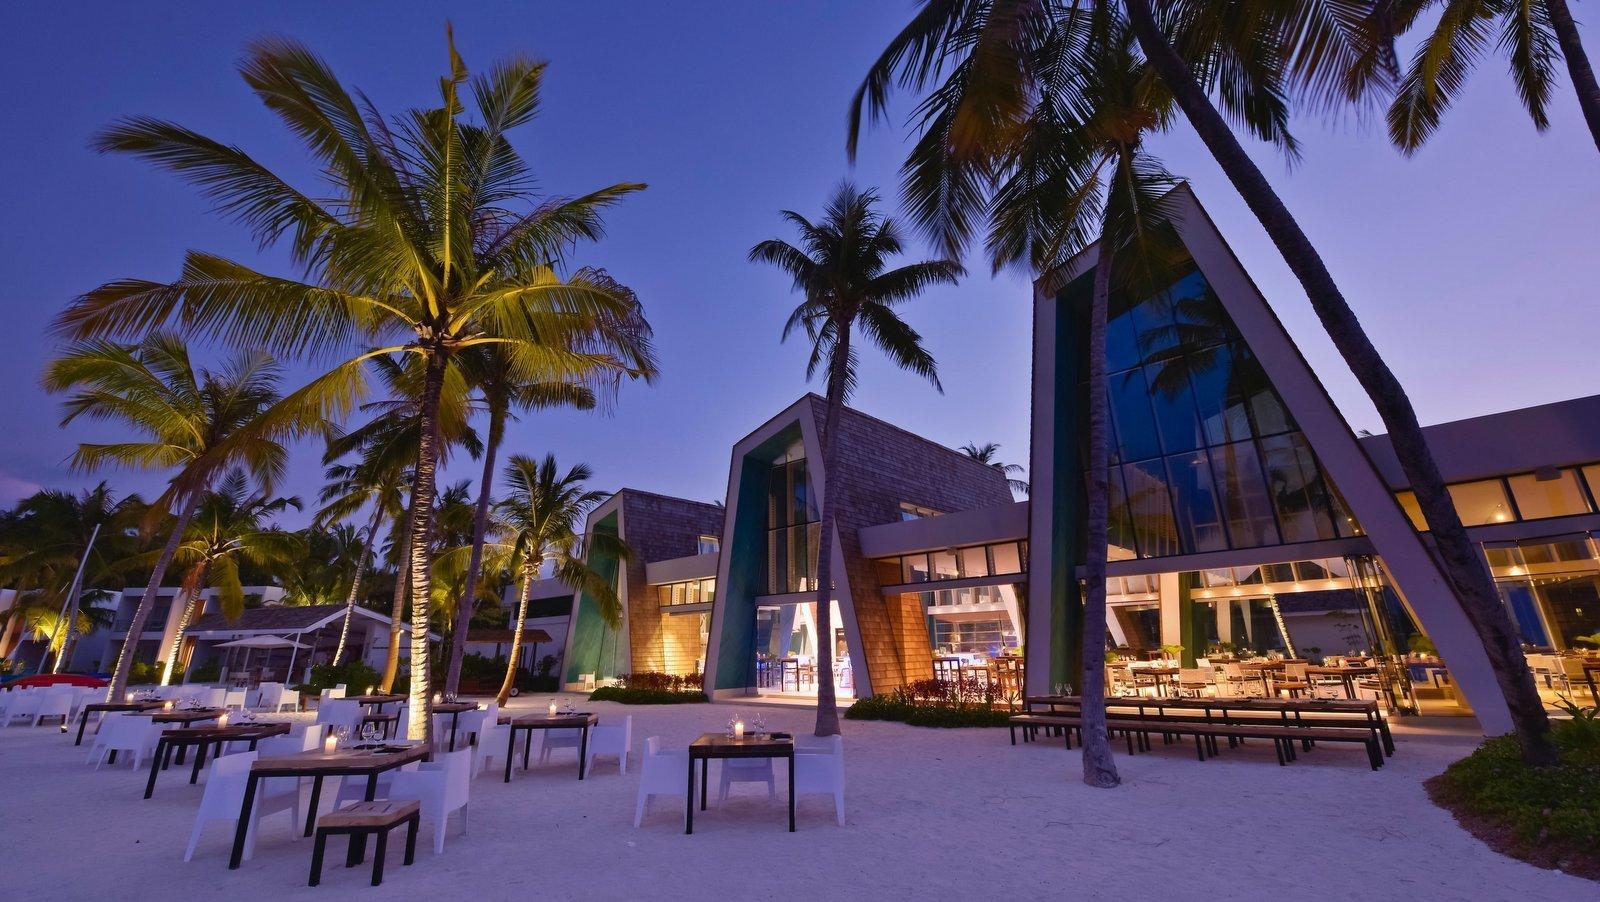 Мальдивы, отель Kandima Maldives, ресторан Smoked